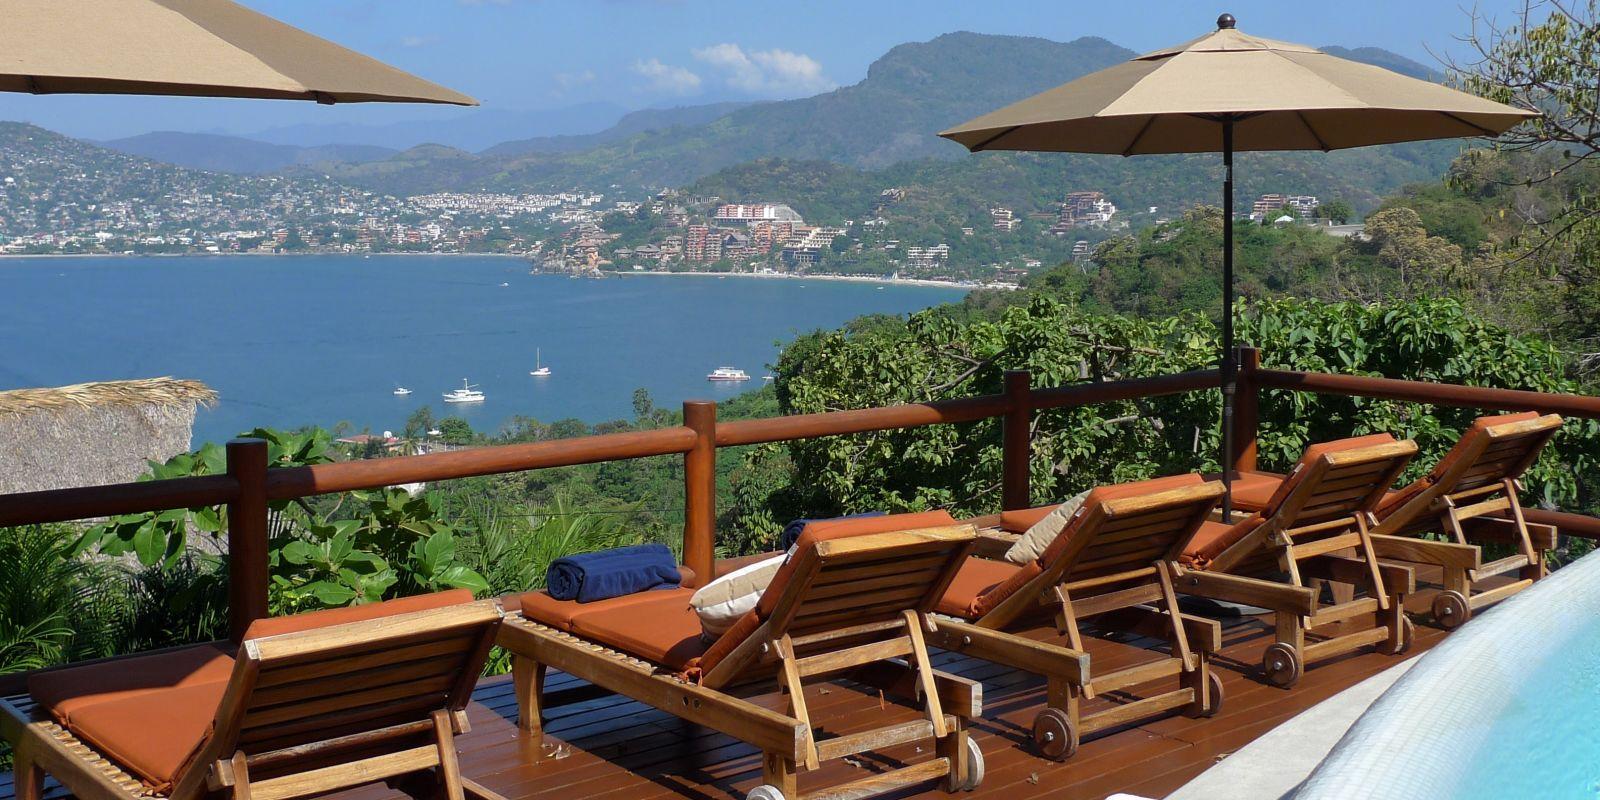 The view Solana BandB Zihuatanejo Mexico twmwfk